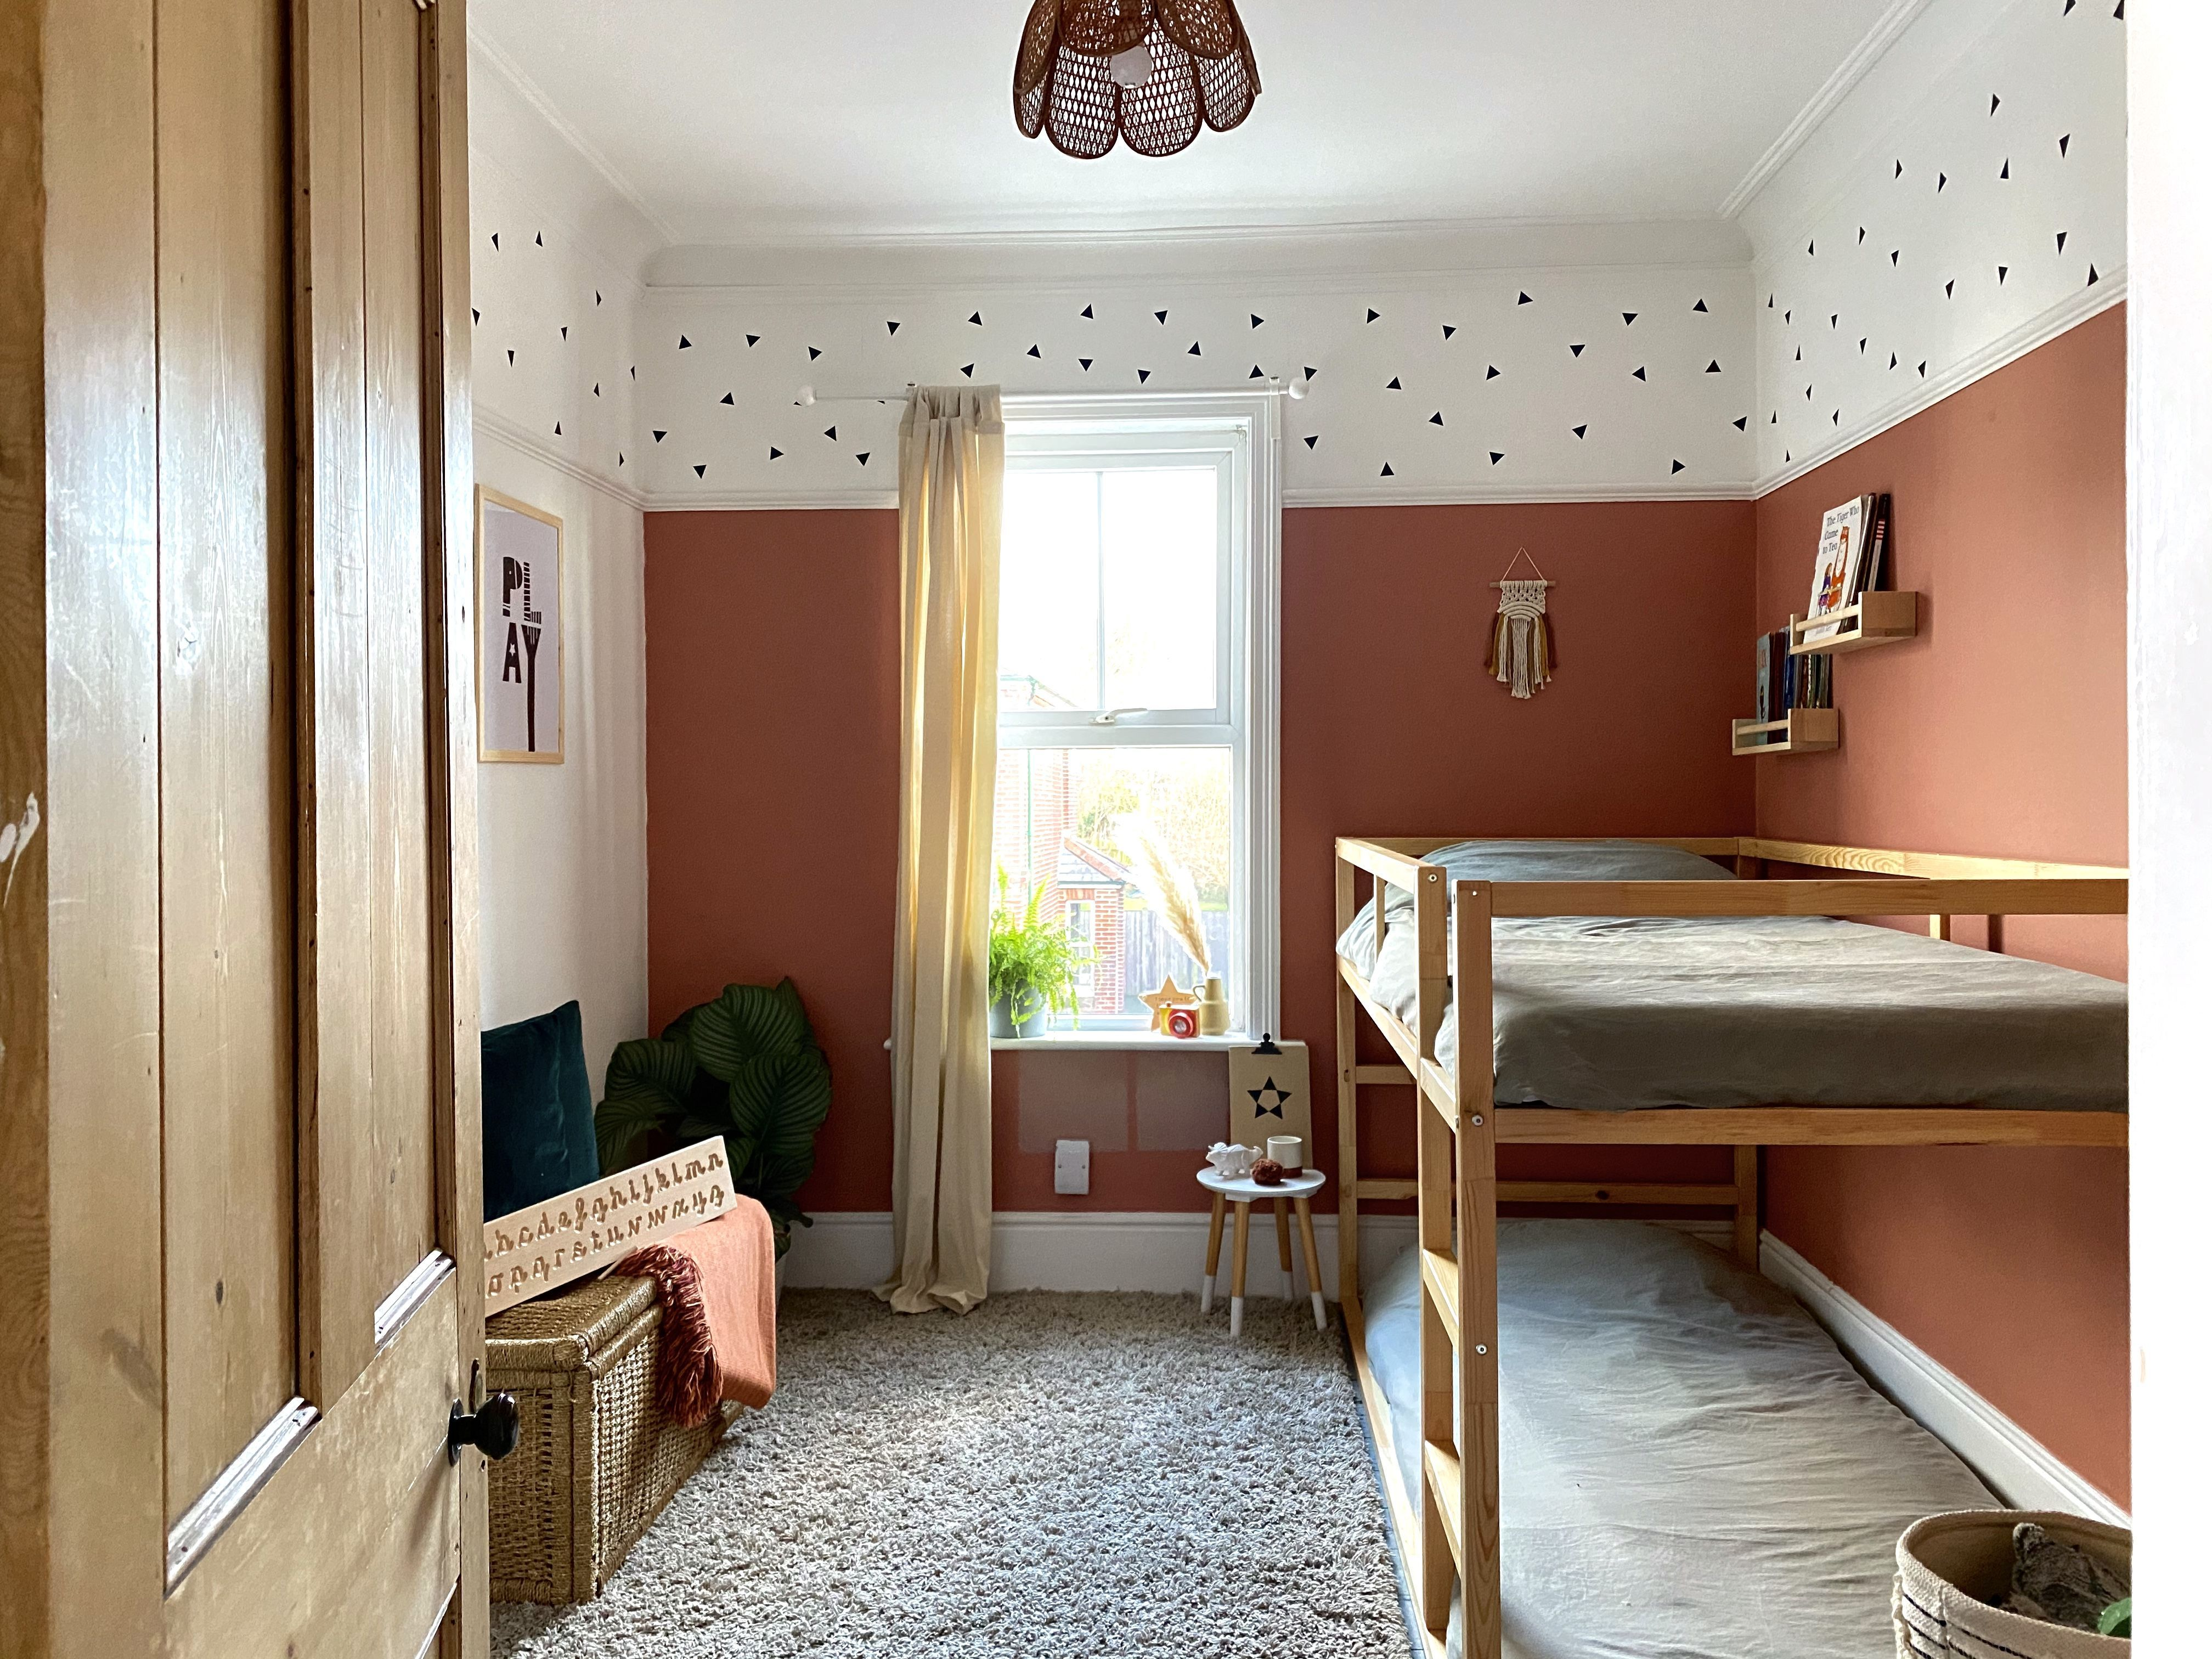 Jungen Schlafzimmer Verjungungskur Geschlechtsneutrale